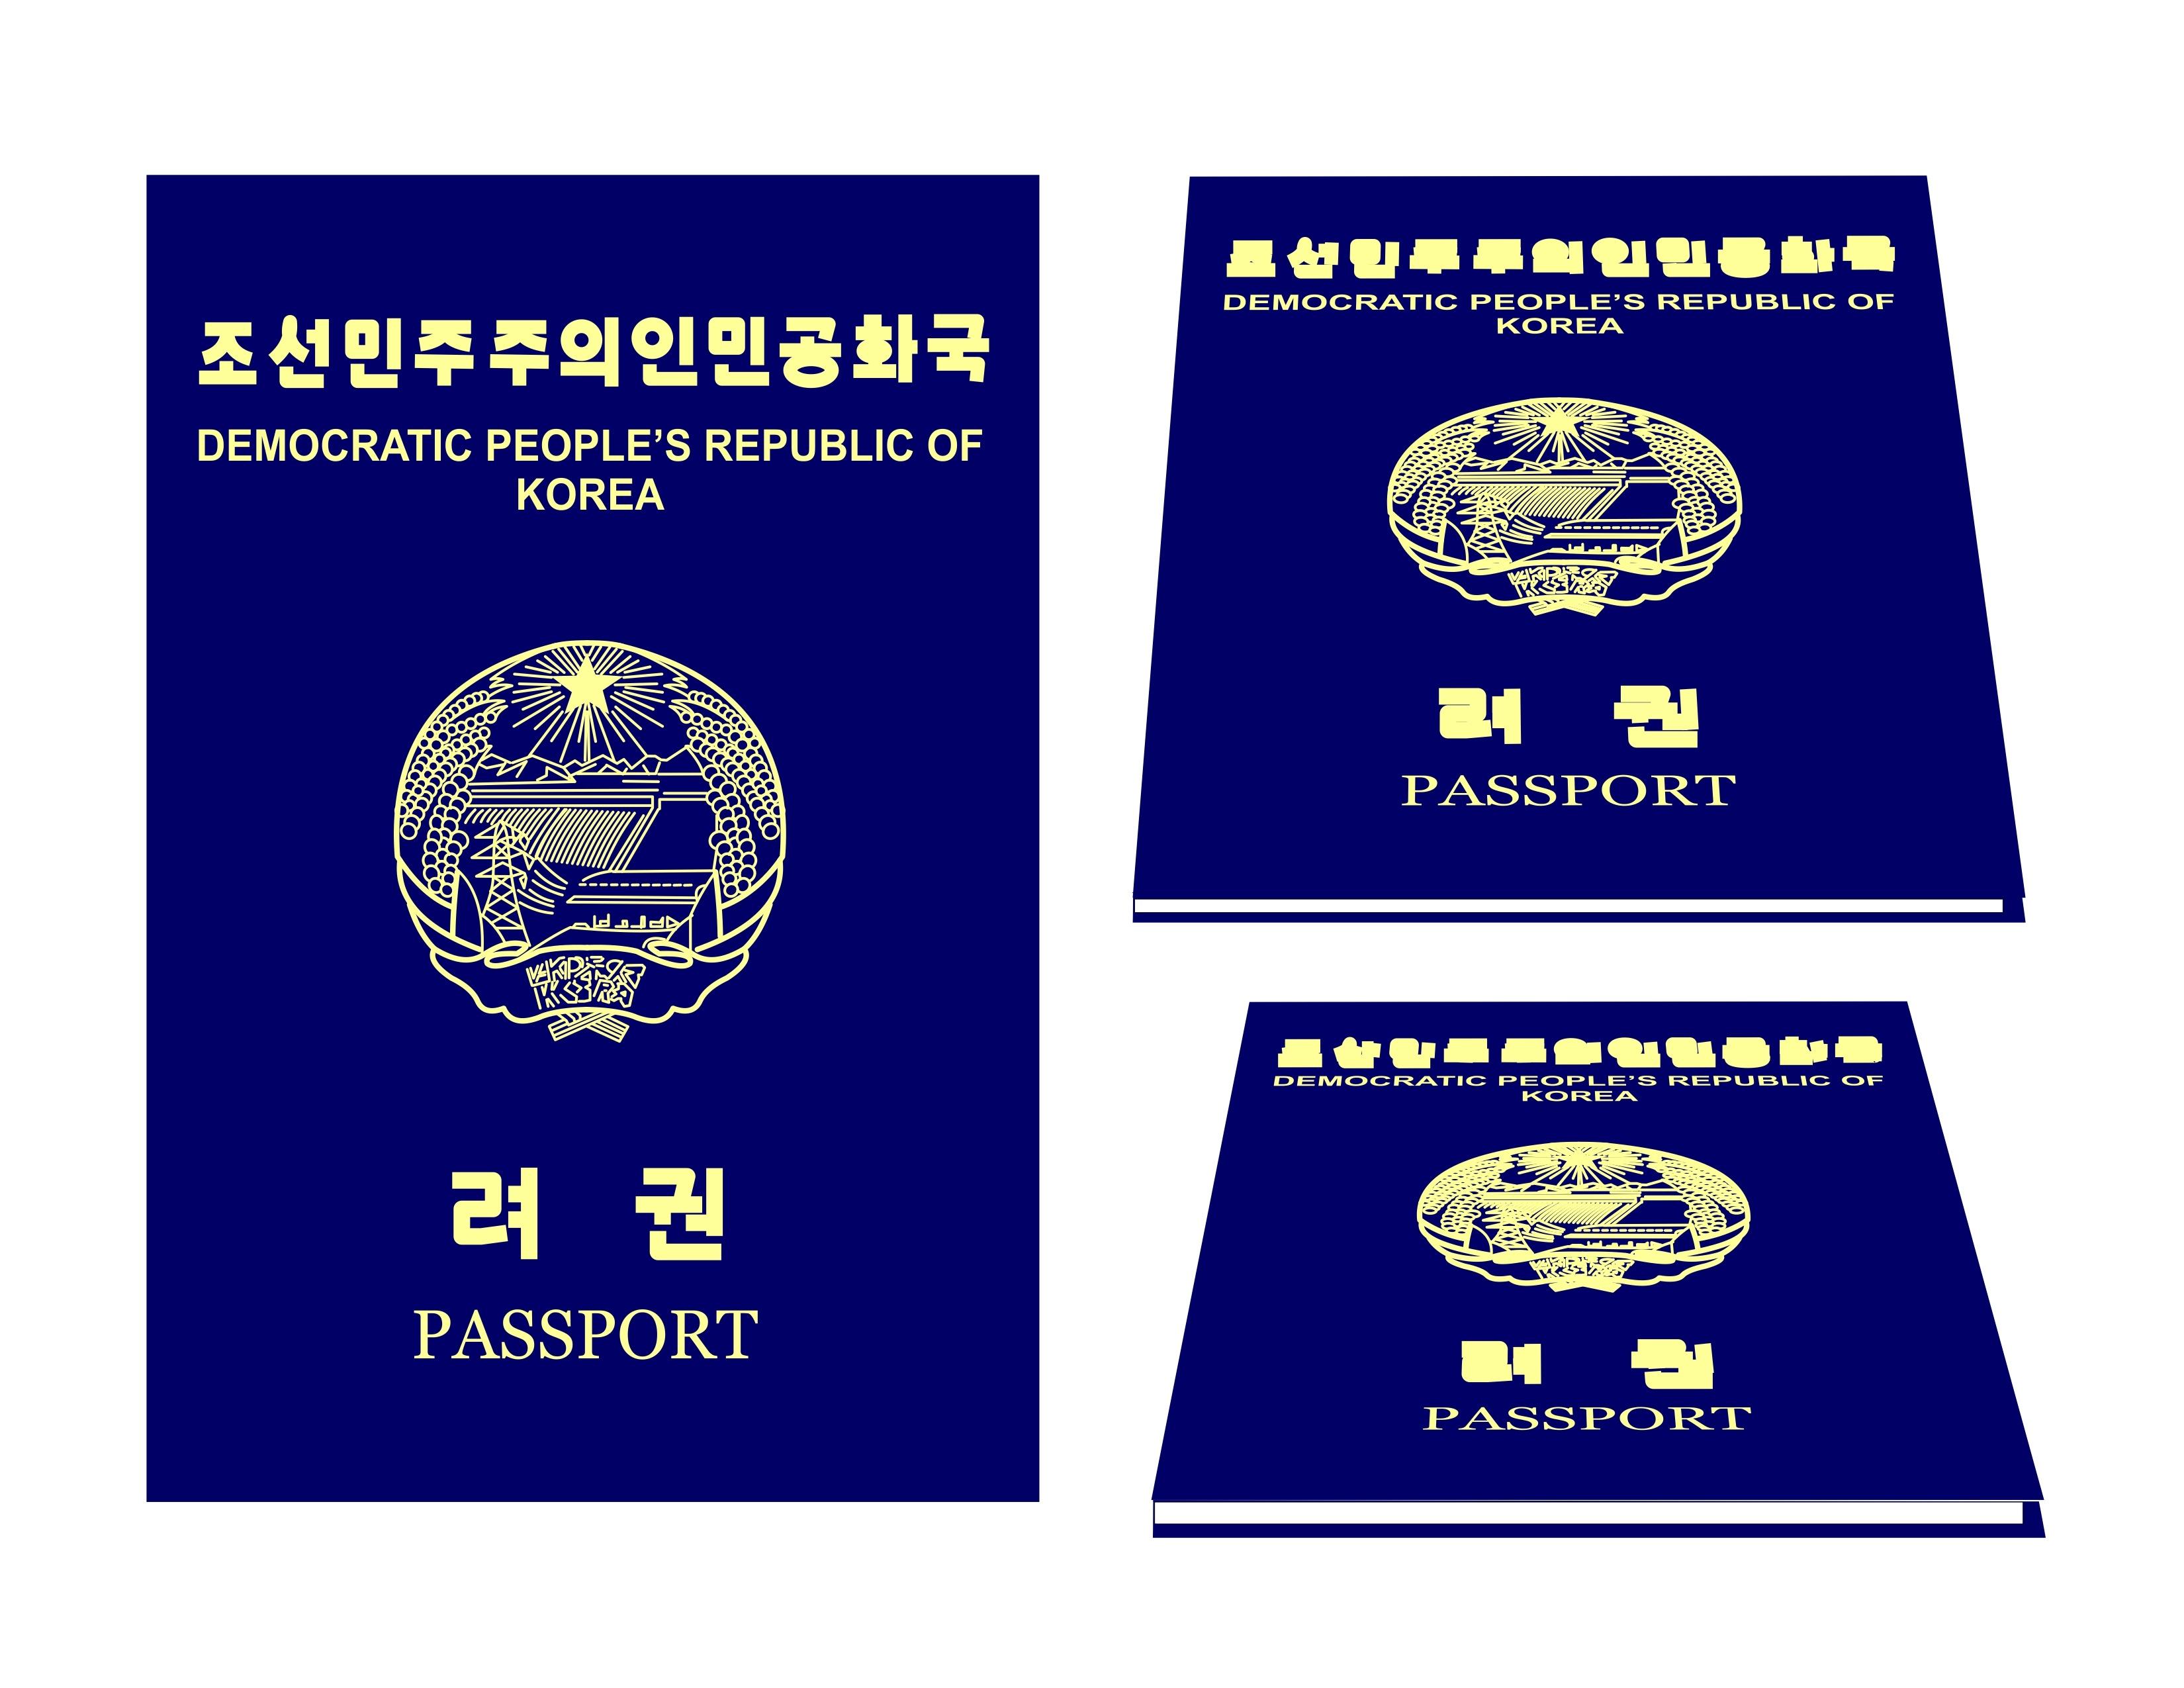 An illustration of a North Korean Passport